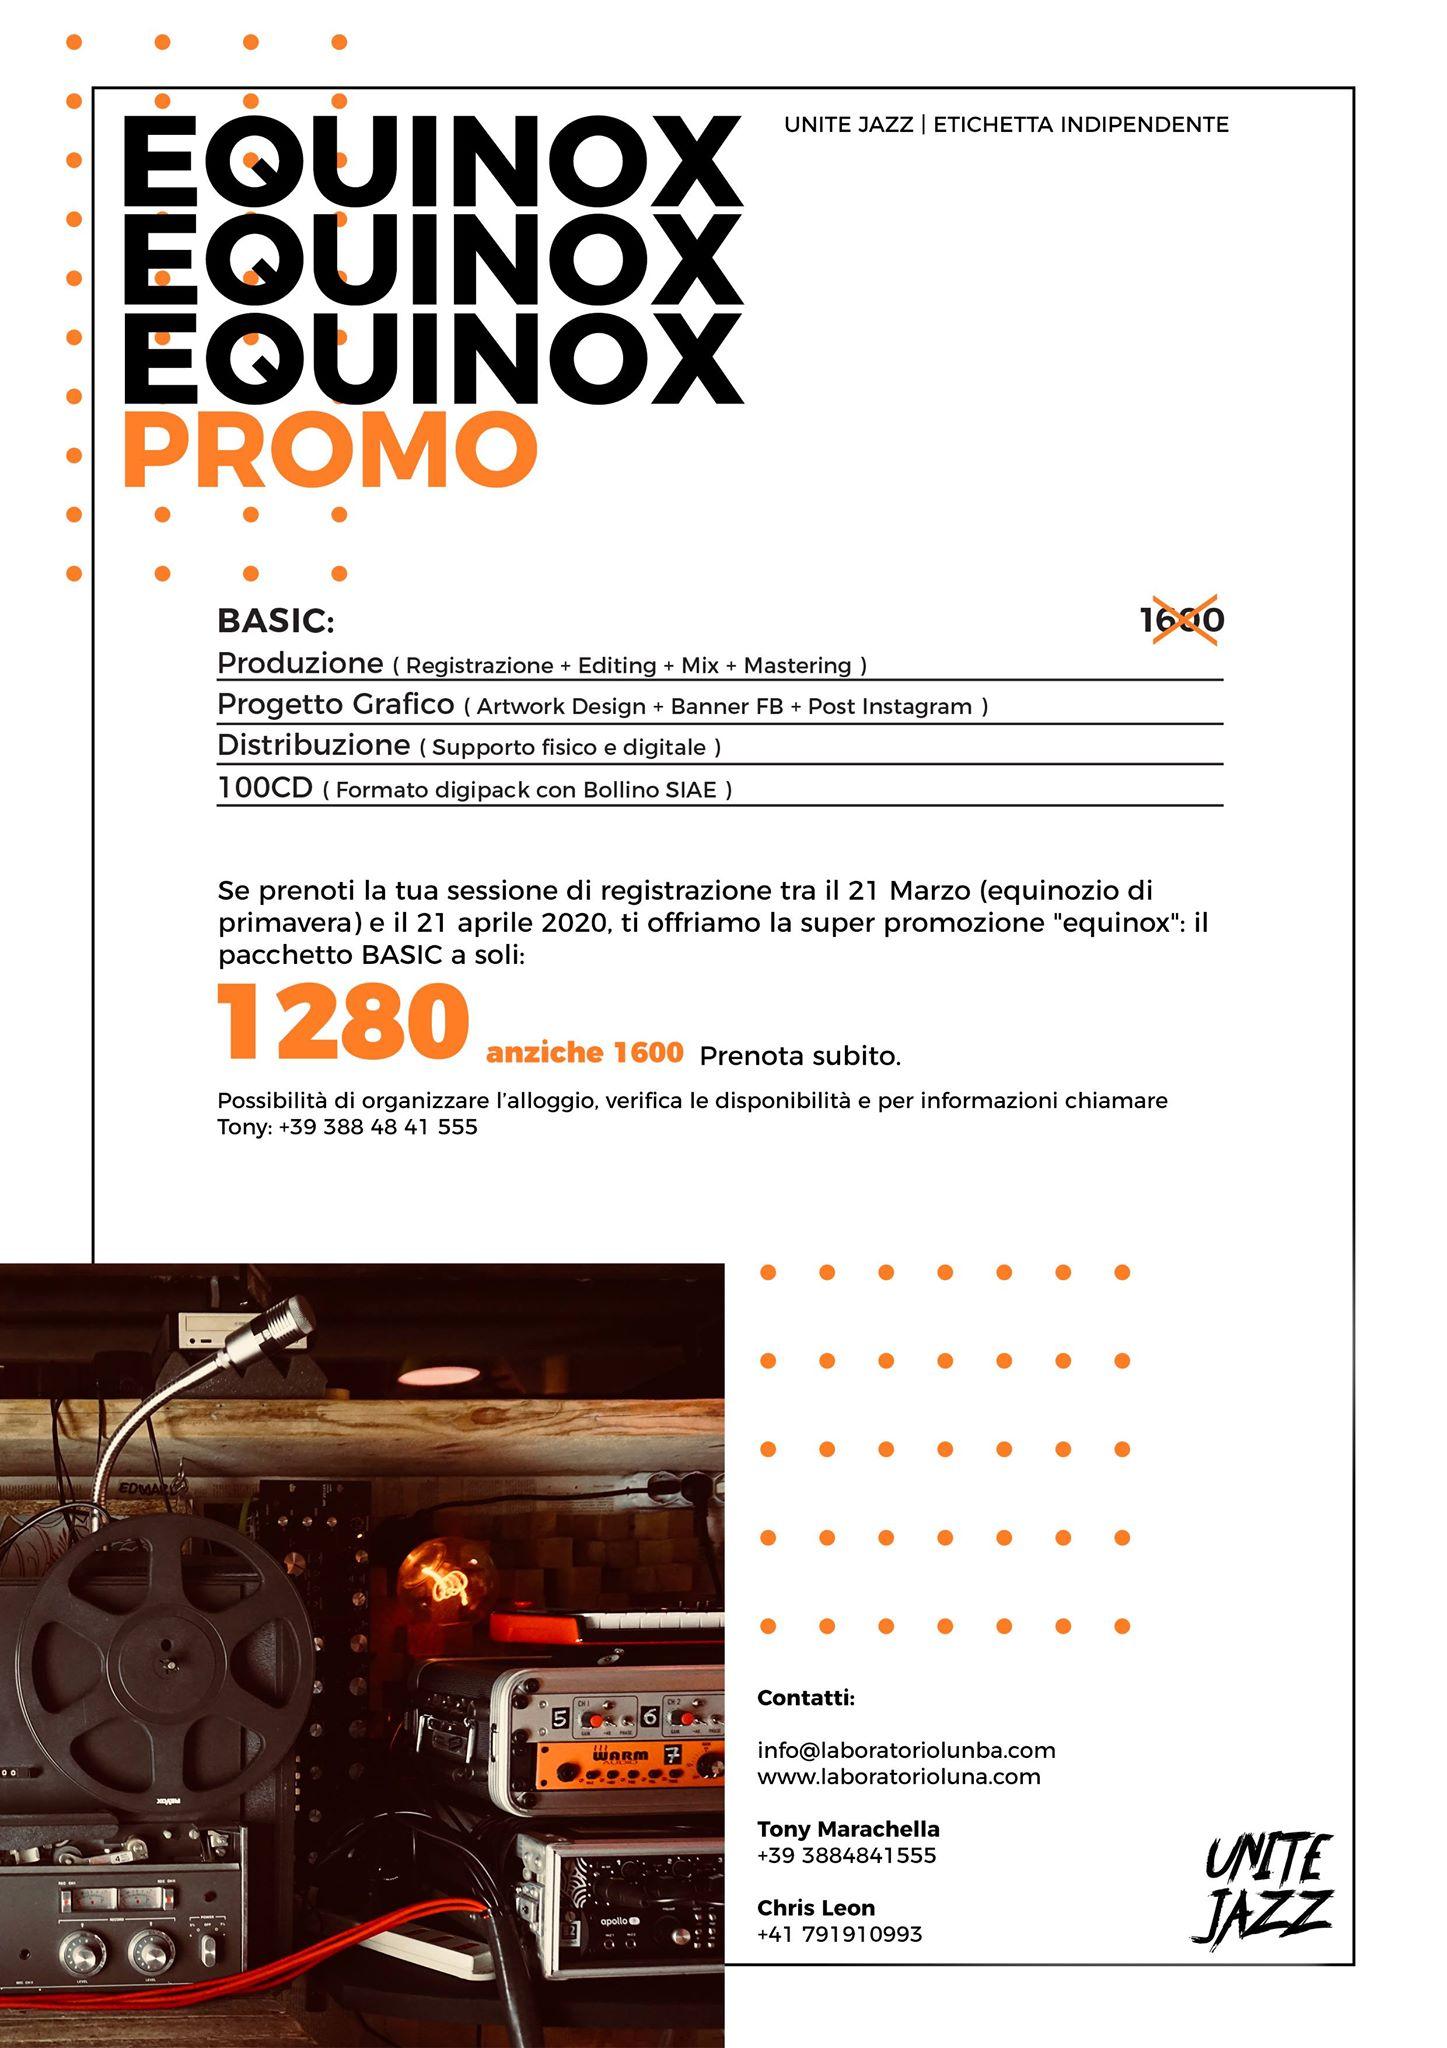 Unite Jazz_promo_equnox2020